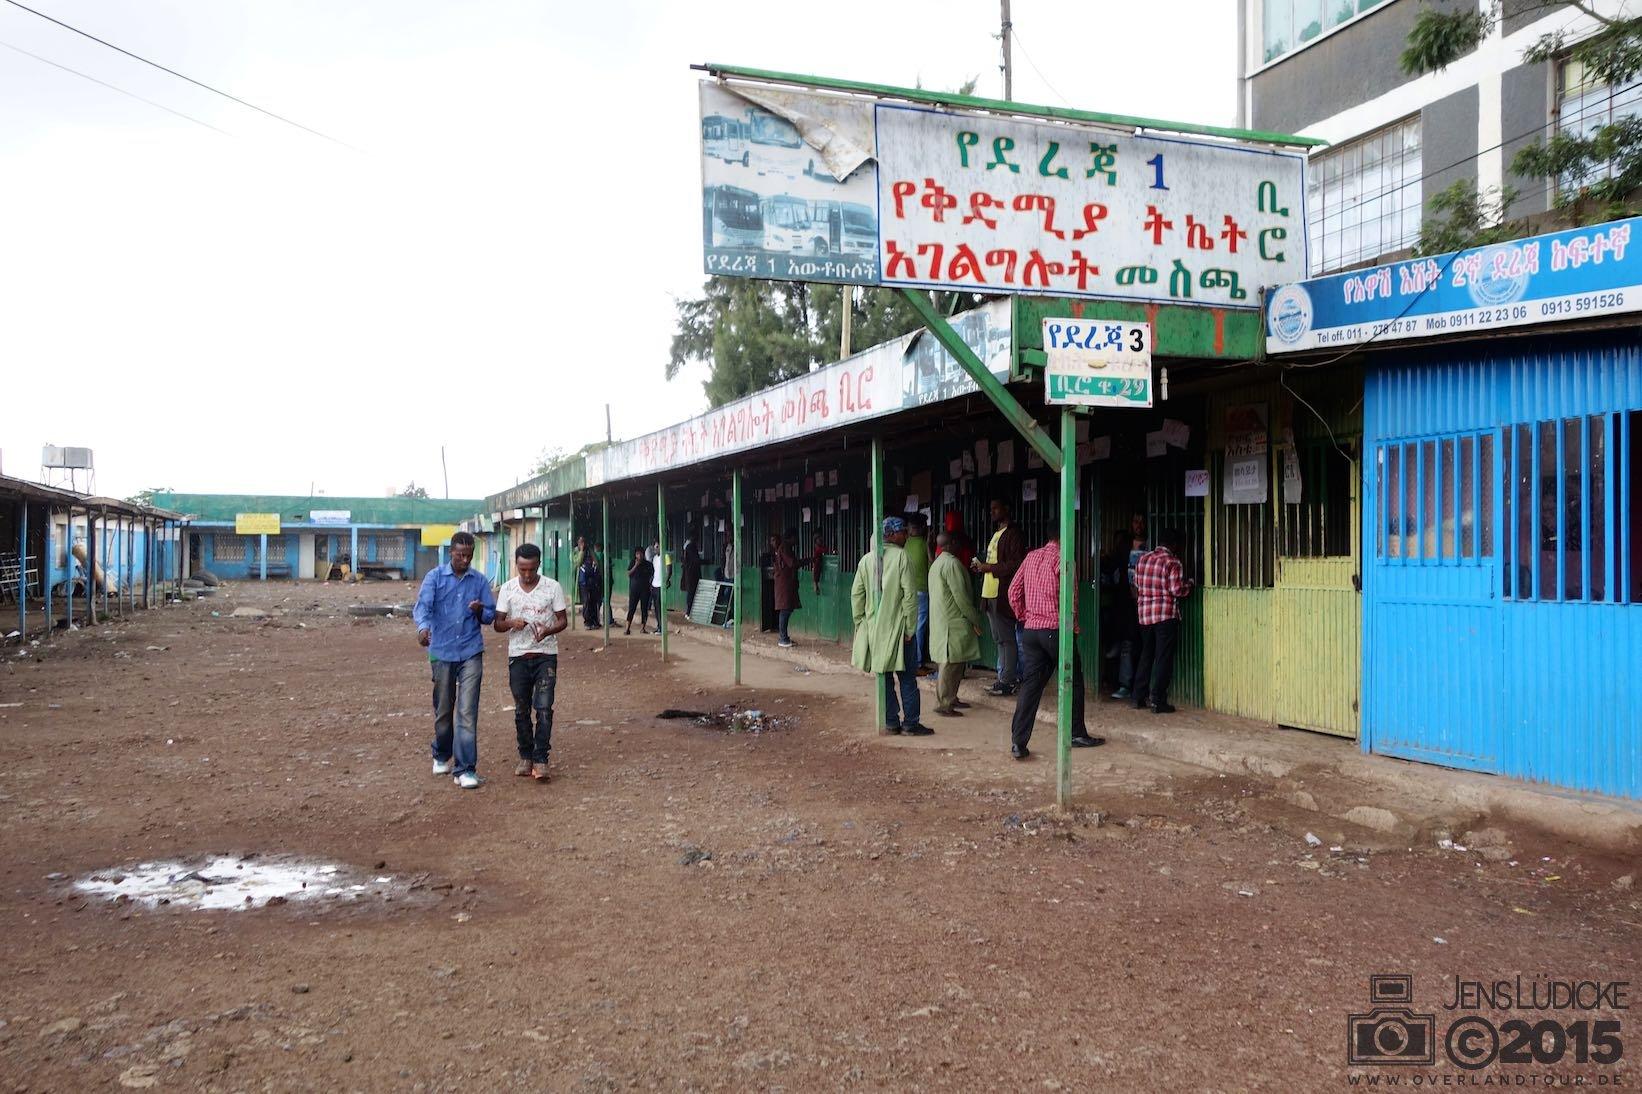 Addis Abeba - Busbahnhof